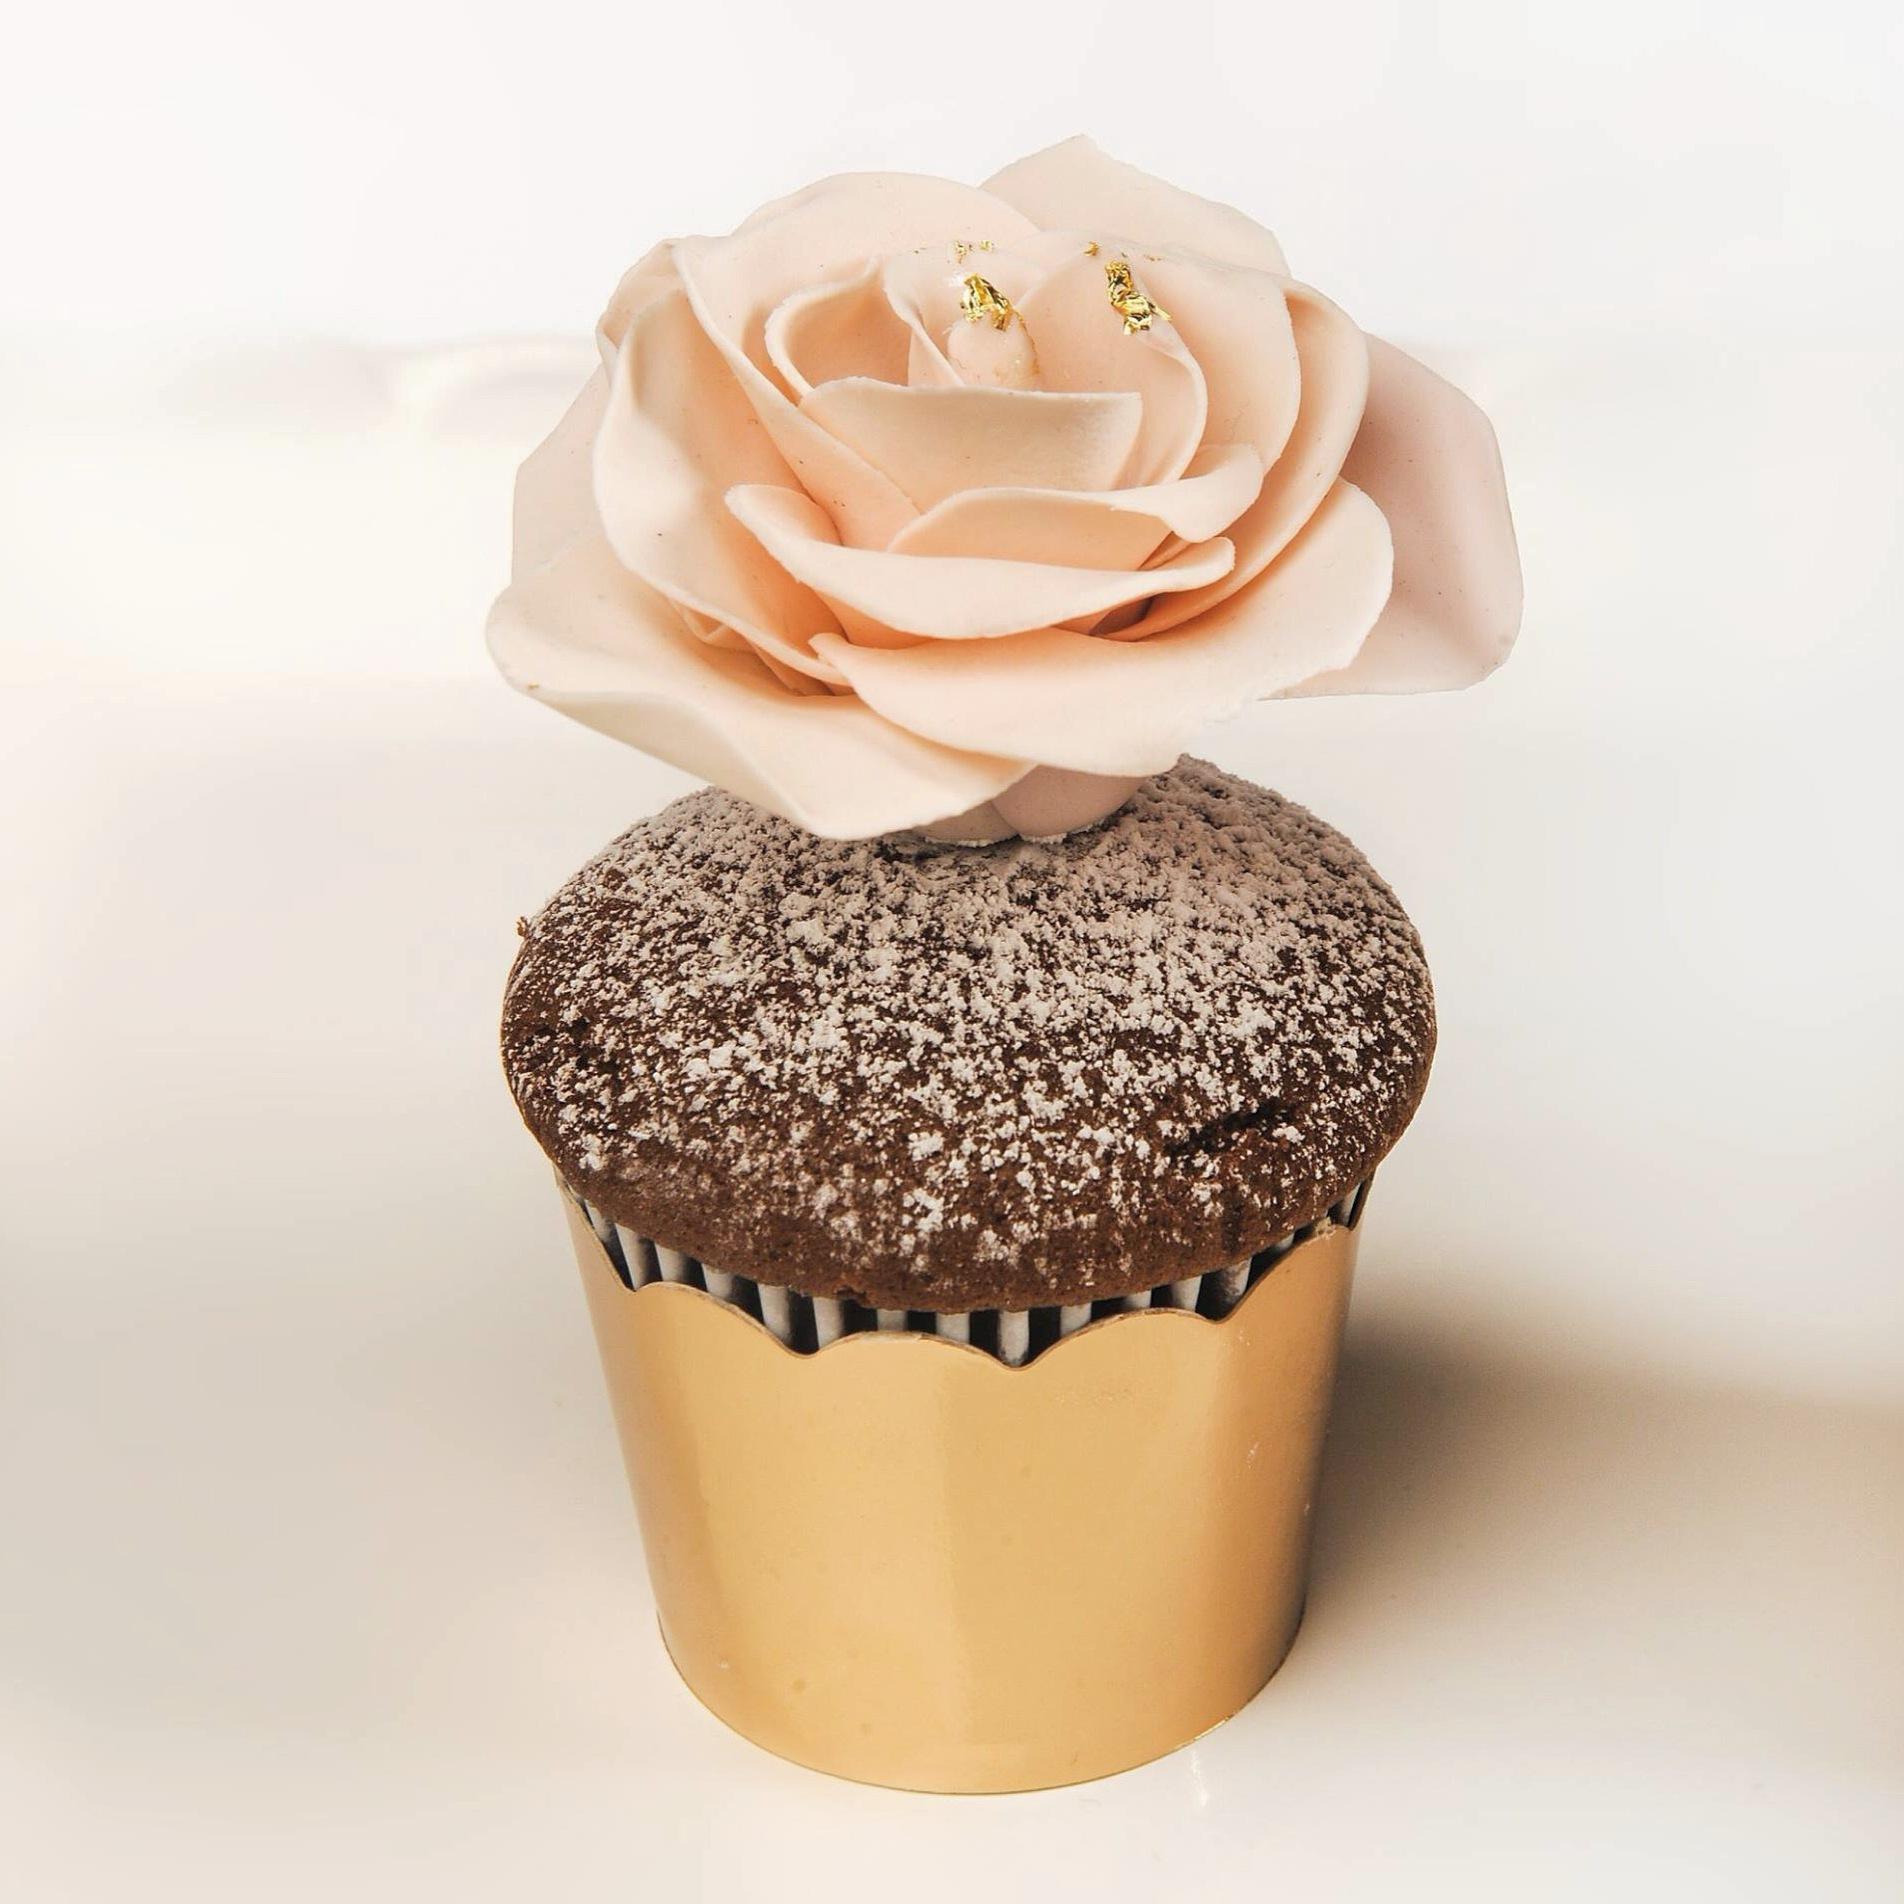 Pink Gum Paste Flower Cupcake